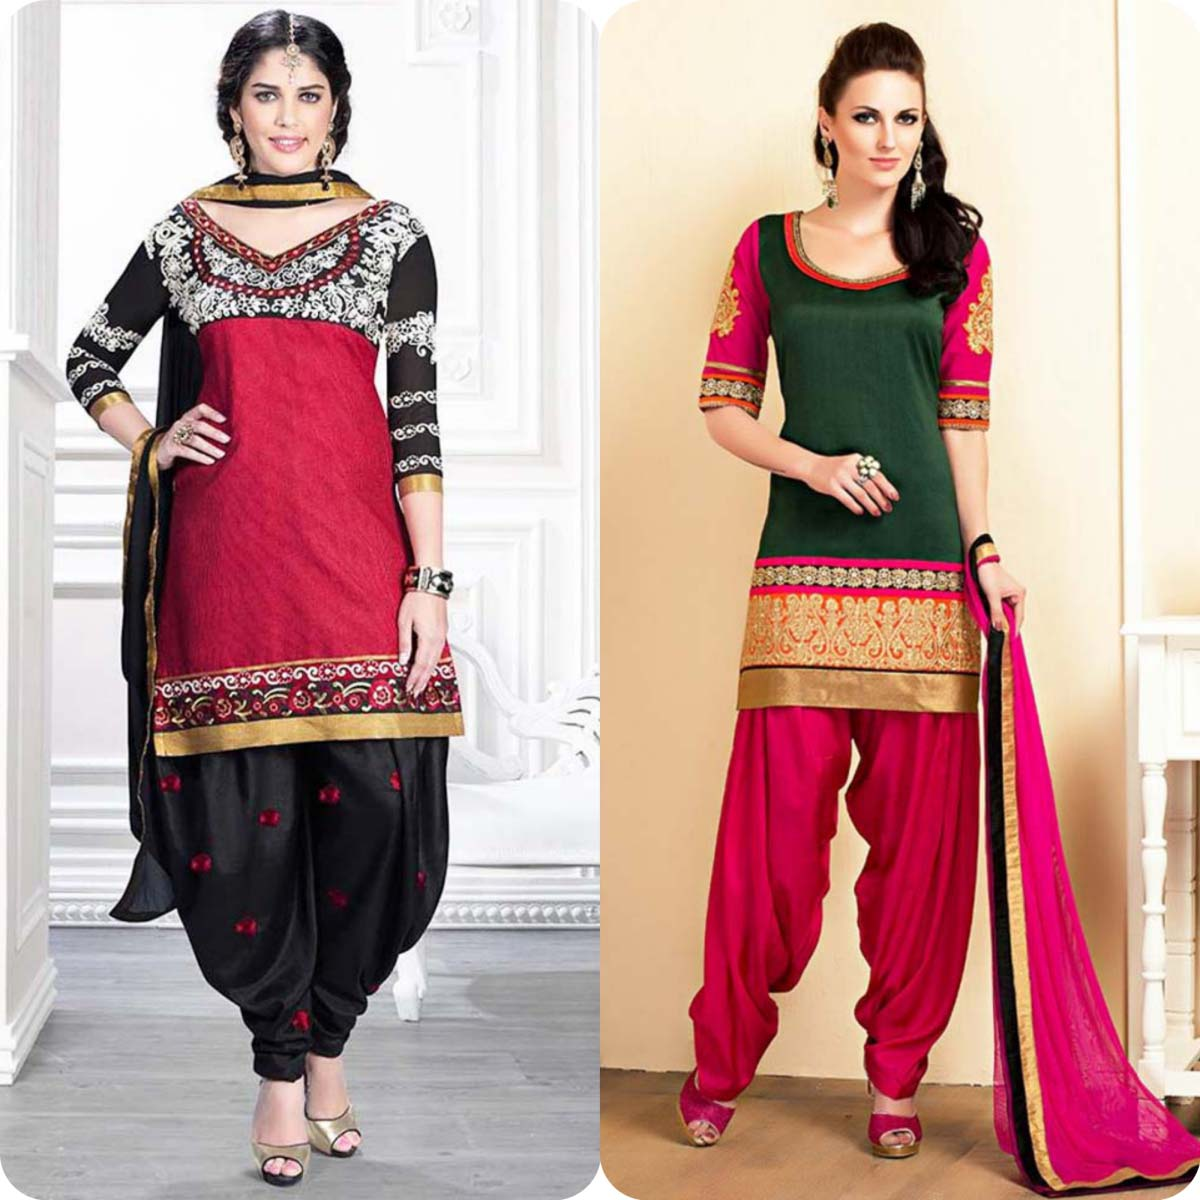 Latest Pakistani and Indian Patiala Shalwar Kameez Suits Designs (12)